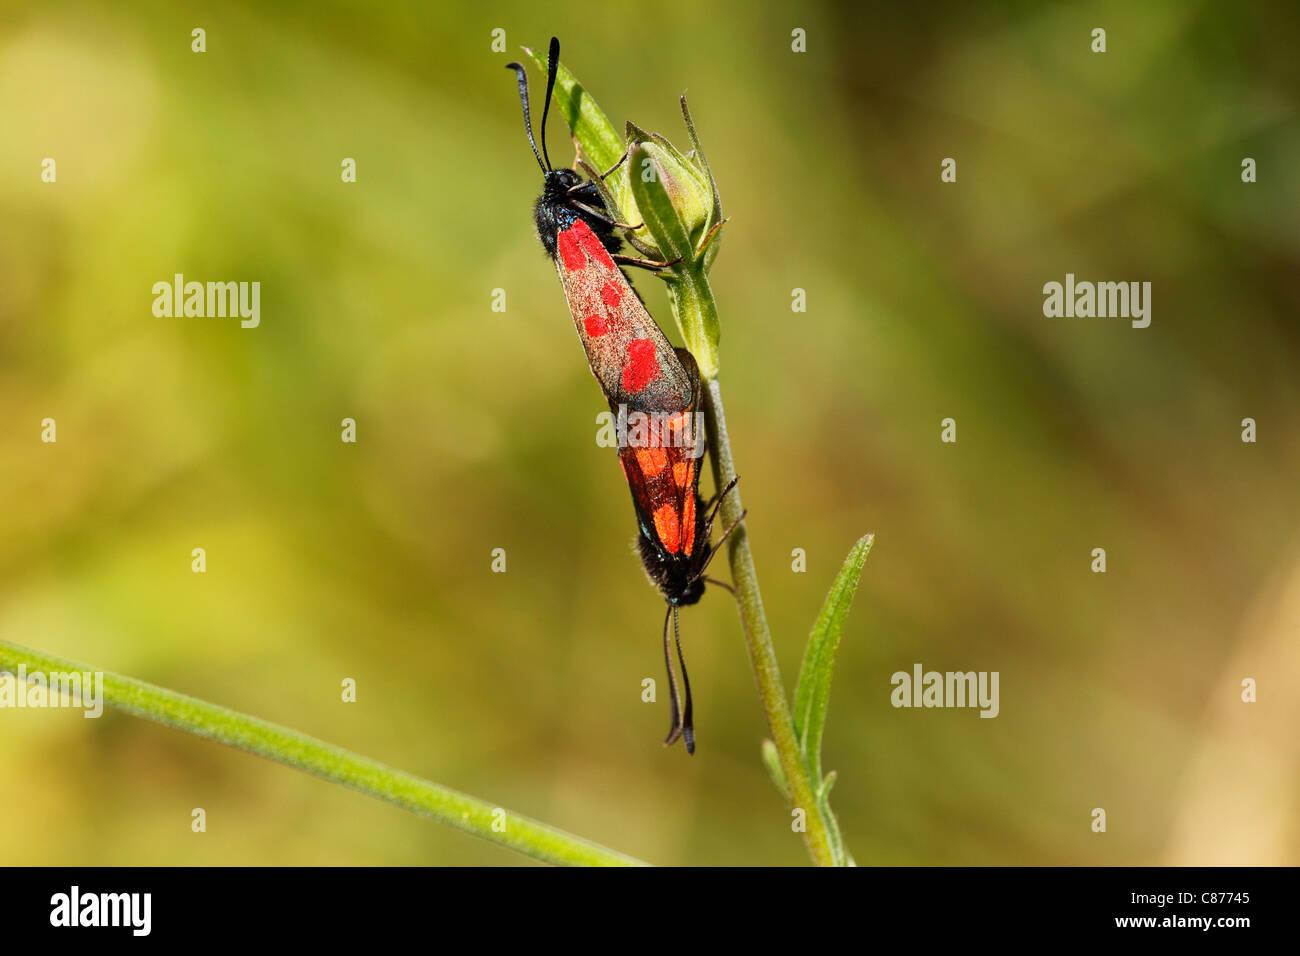 Austria, Wachau, Close up of Six-spot Burnet mating on stem - Stock Image